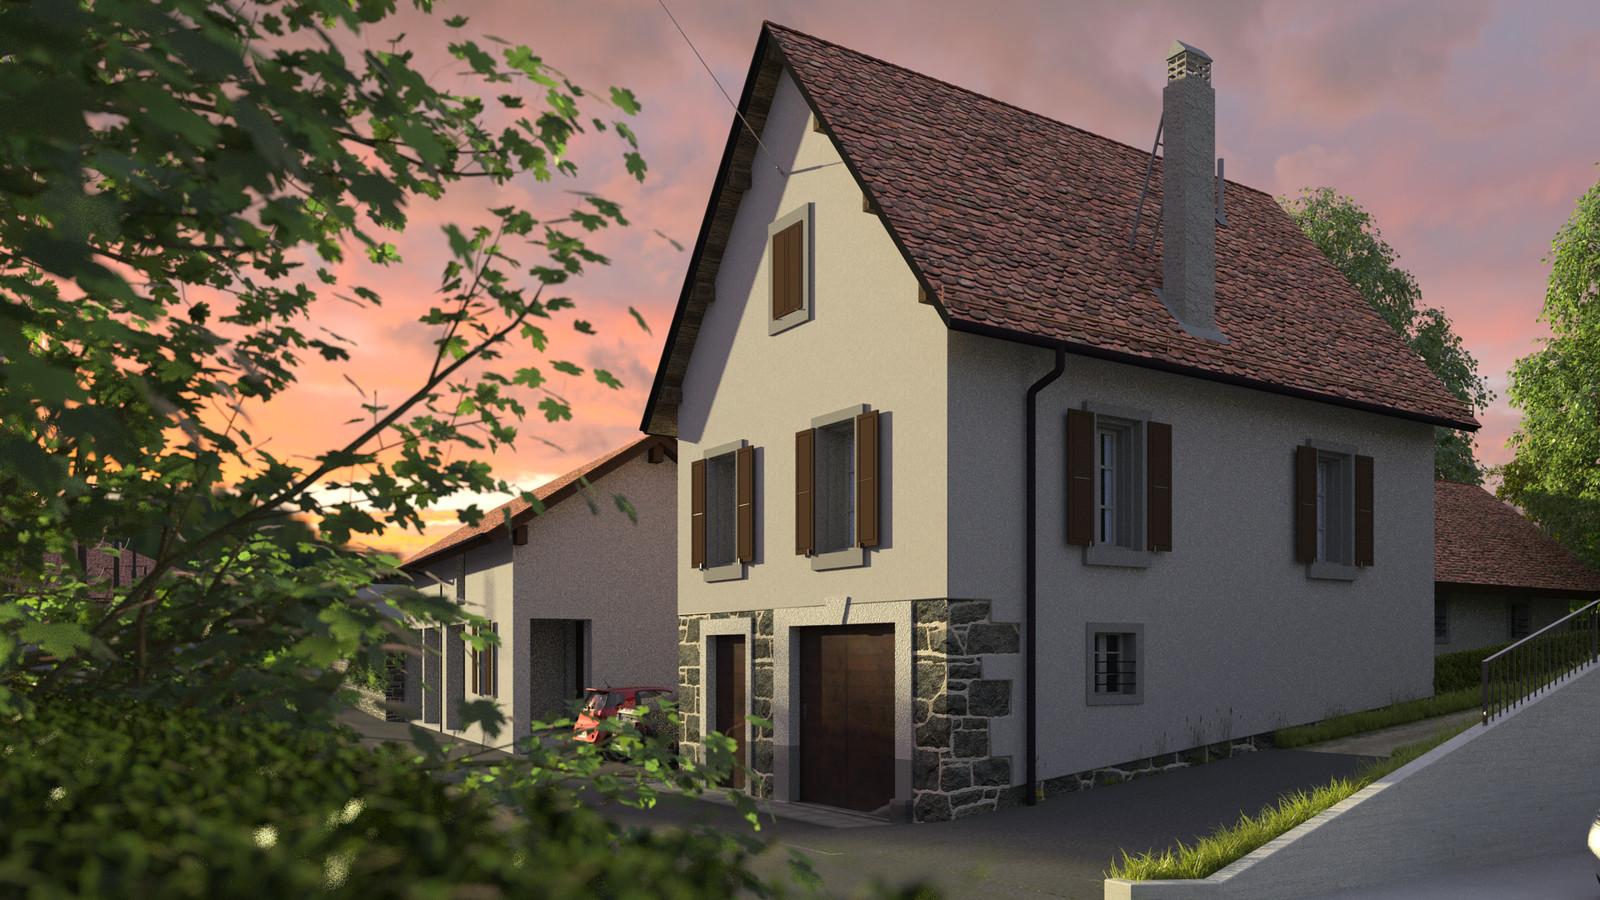 SketchUp + Thea Render  Little Swiss House Scene 28 174-hdri-skies 01 HD 1920 x 1080 Presto MC  HDR by HDRI-SKIES found here: http://hdri-skies.com/shop/hdri-sky-174/